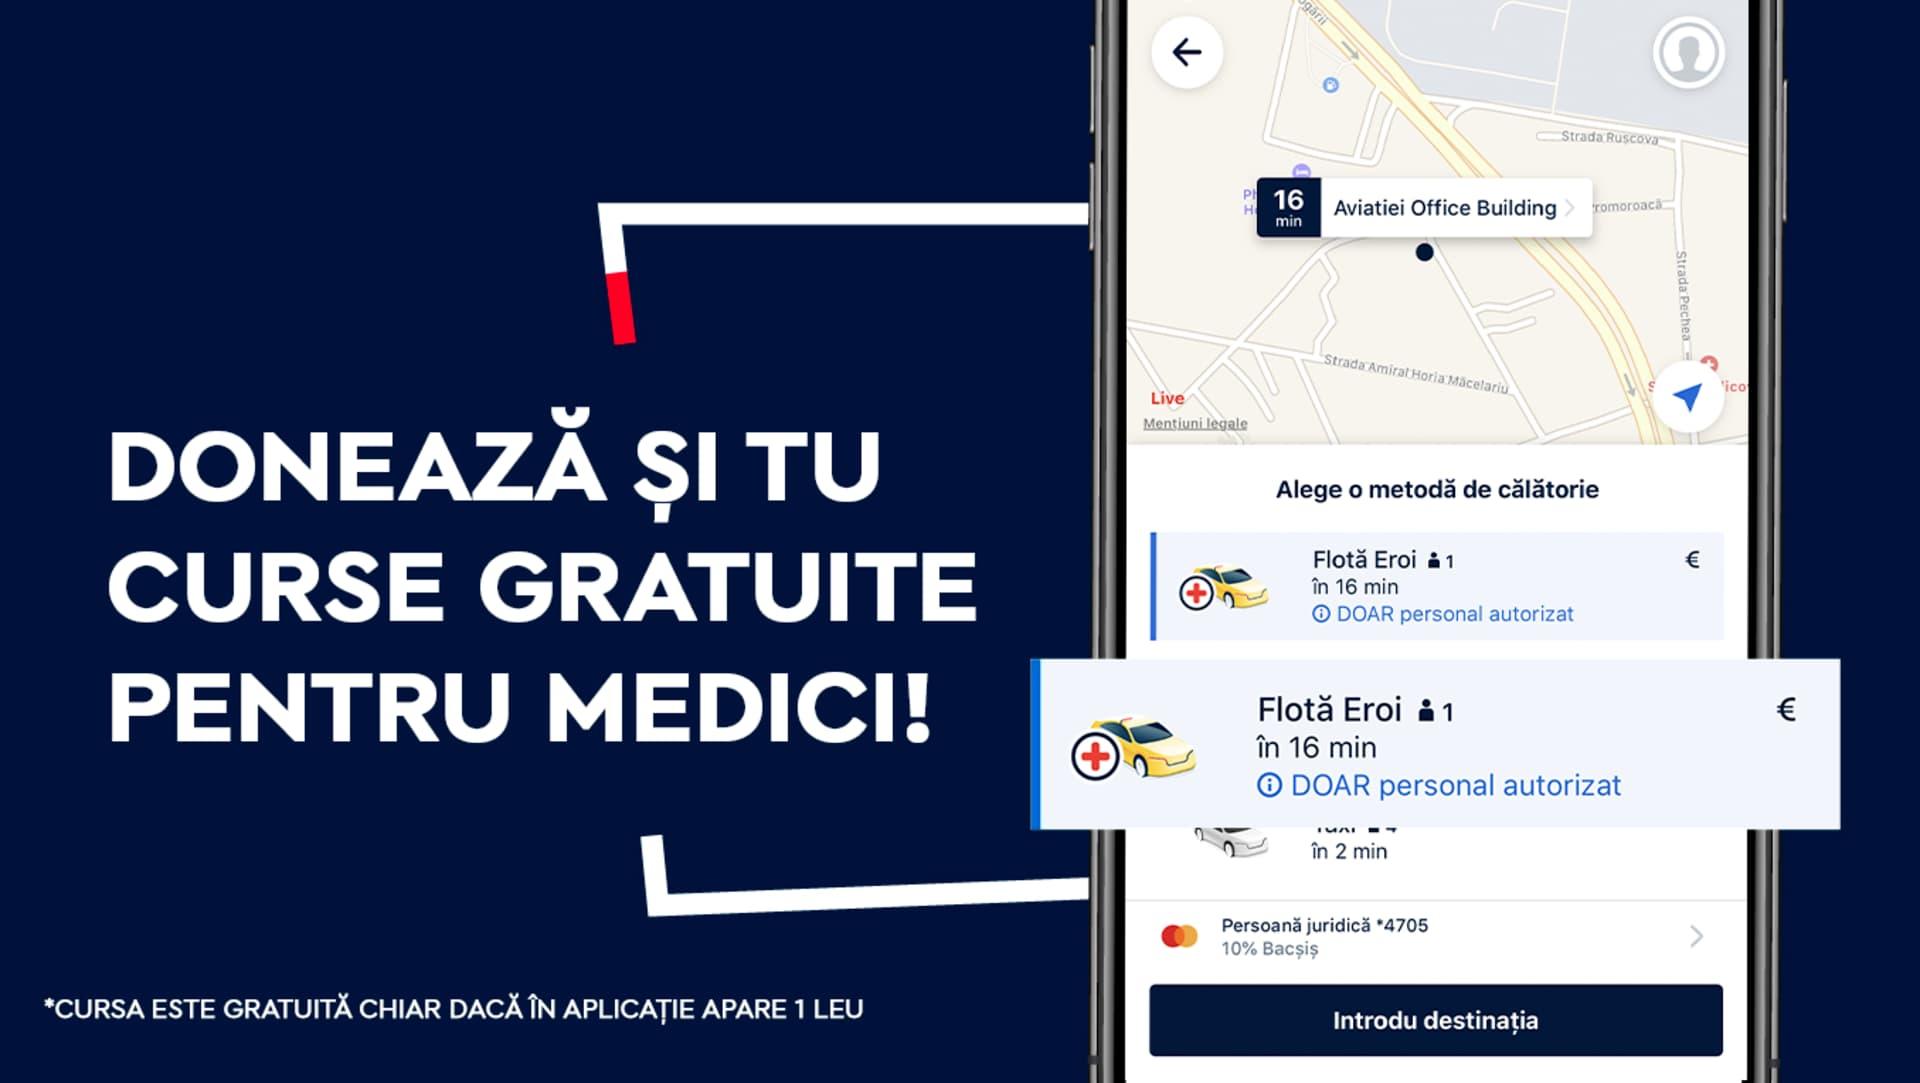 Curse gratuite pentru medicii din Cluj-Napoca prin aplicatia de taxi si ridesharing FREE NOW